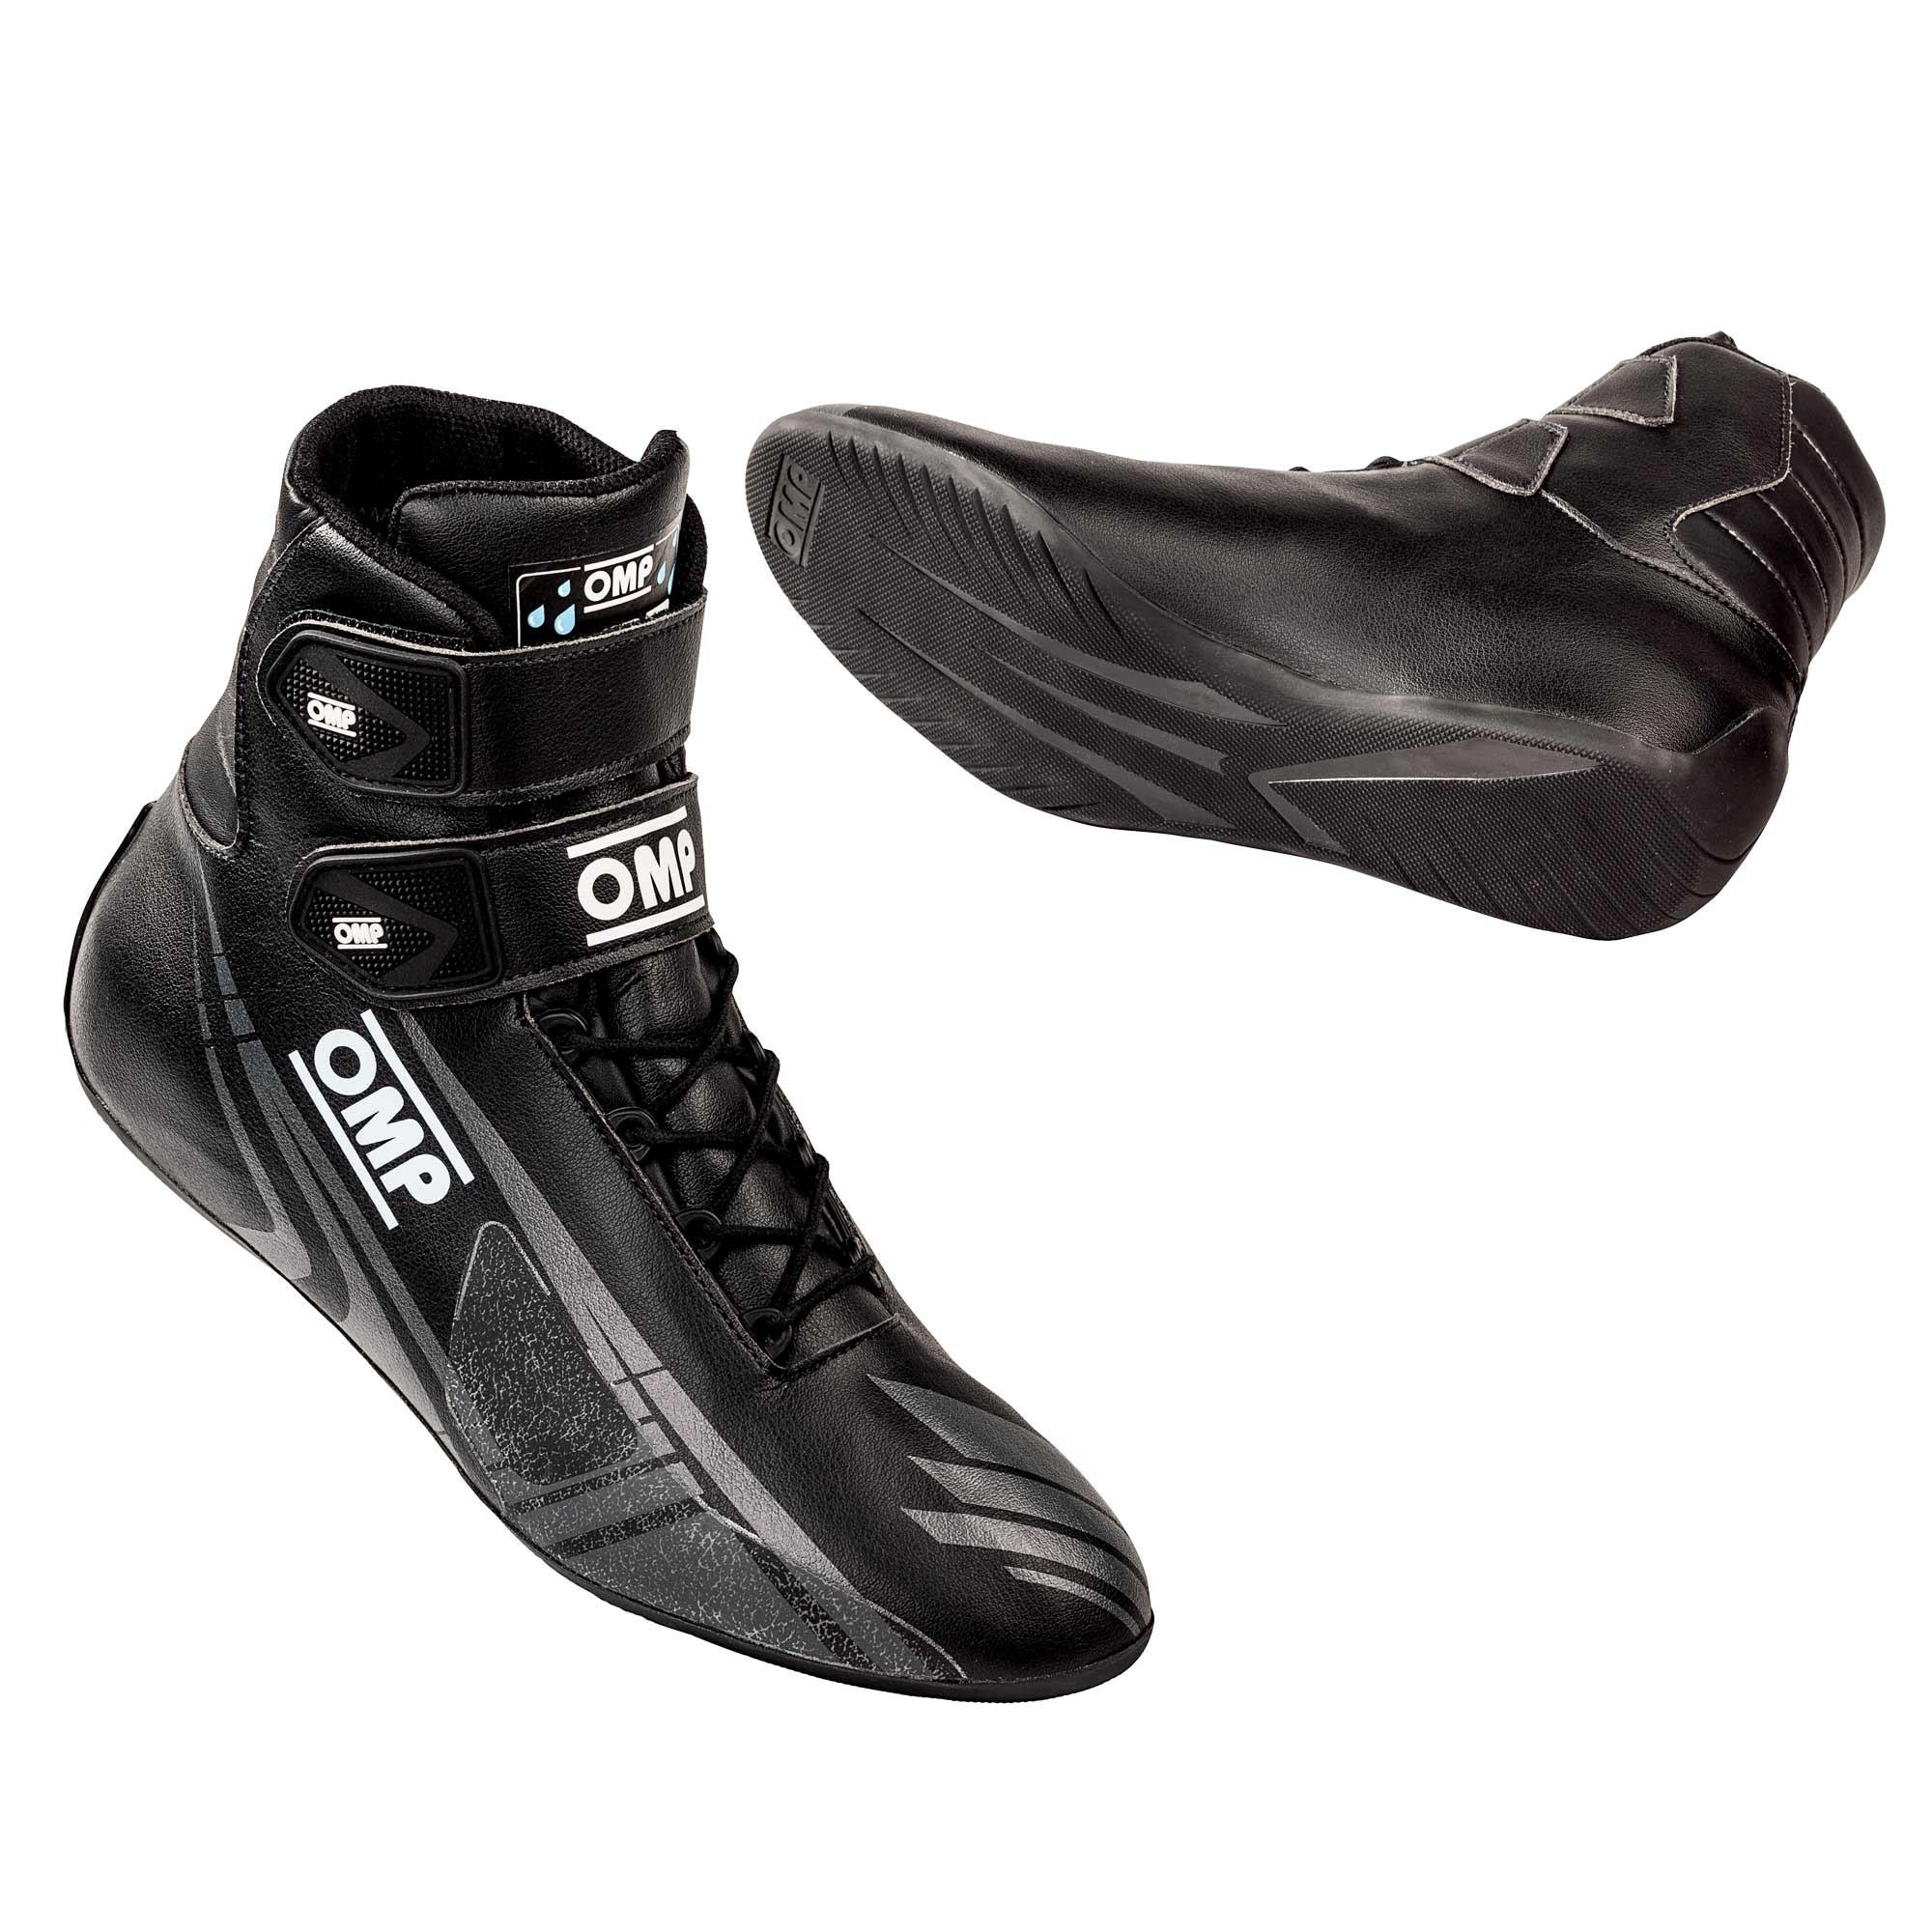 Advanced RainProof (ARP) Shoes